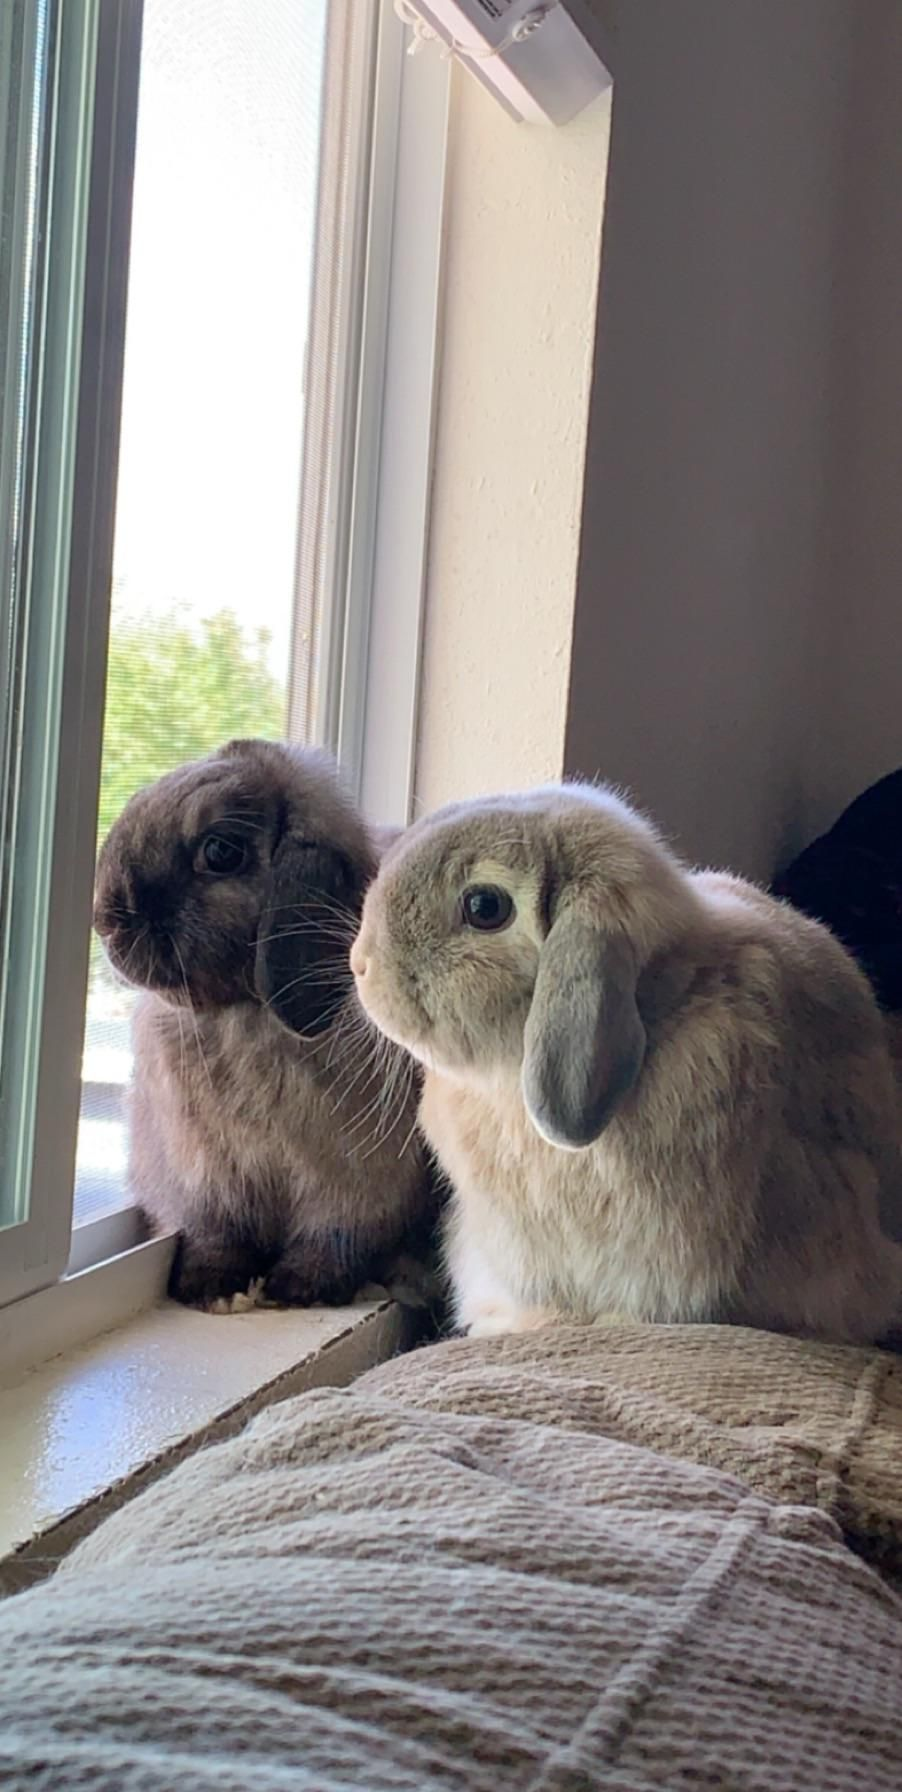 Best Rabbit Treats and Toys! #bunnylovers #rabbithouses #rabbitlove